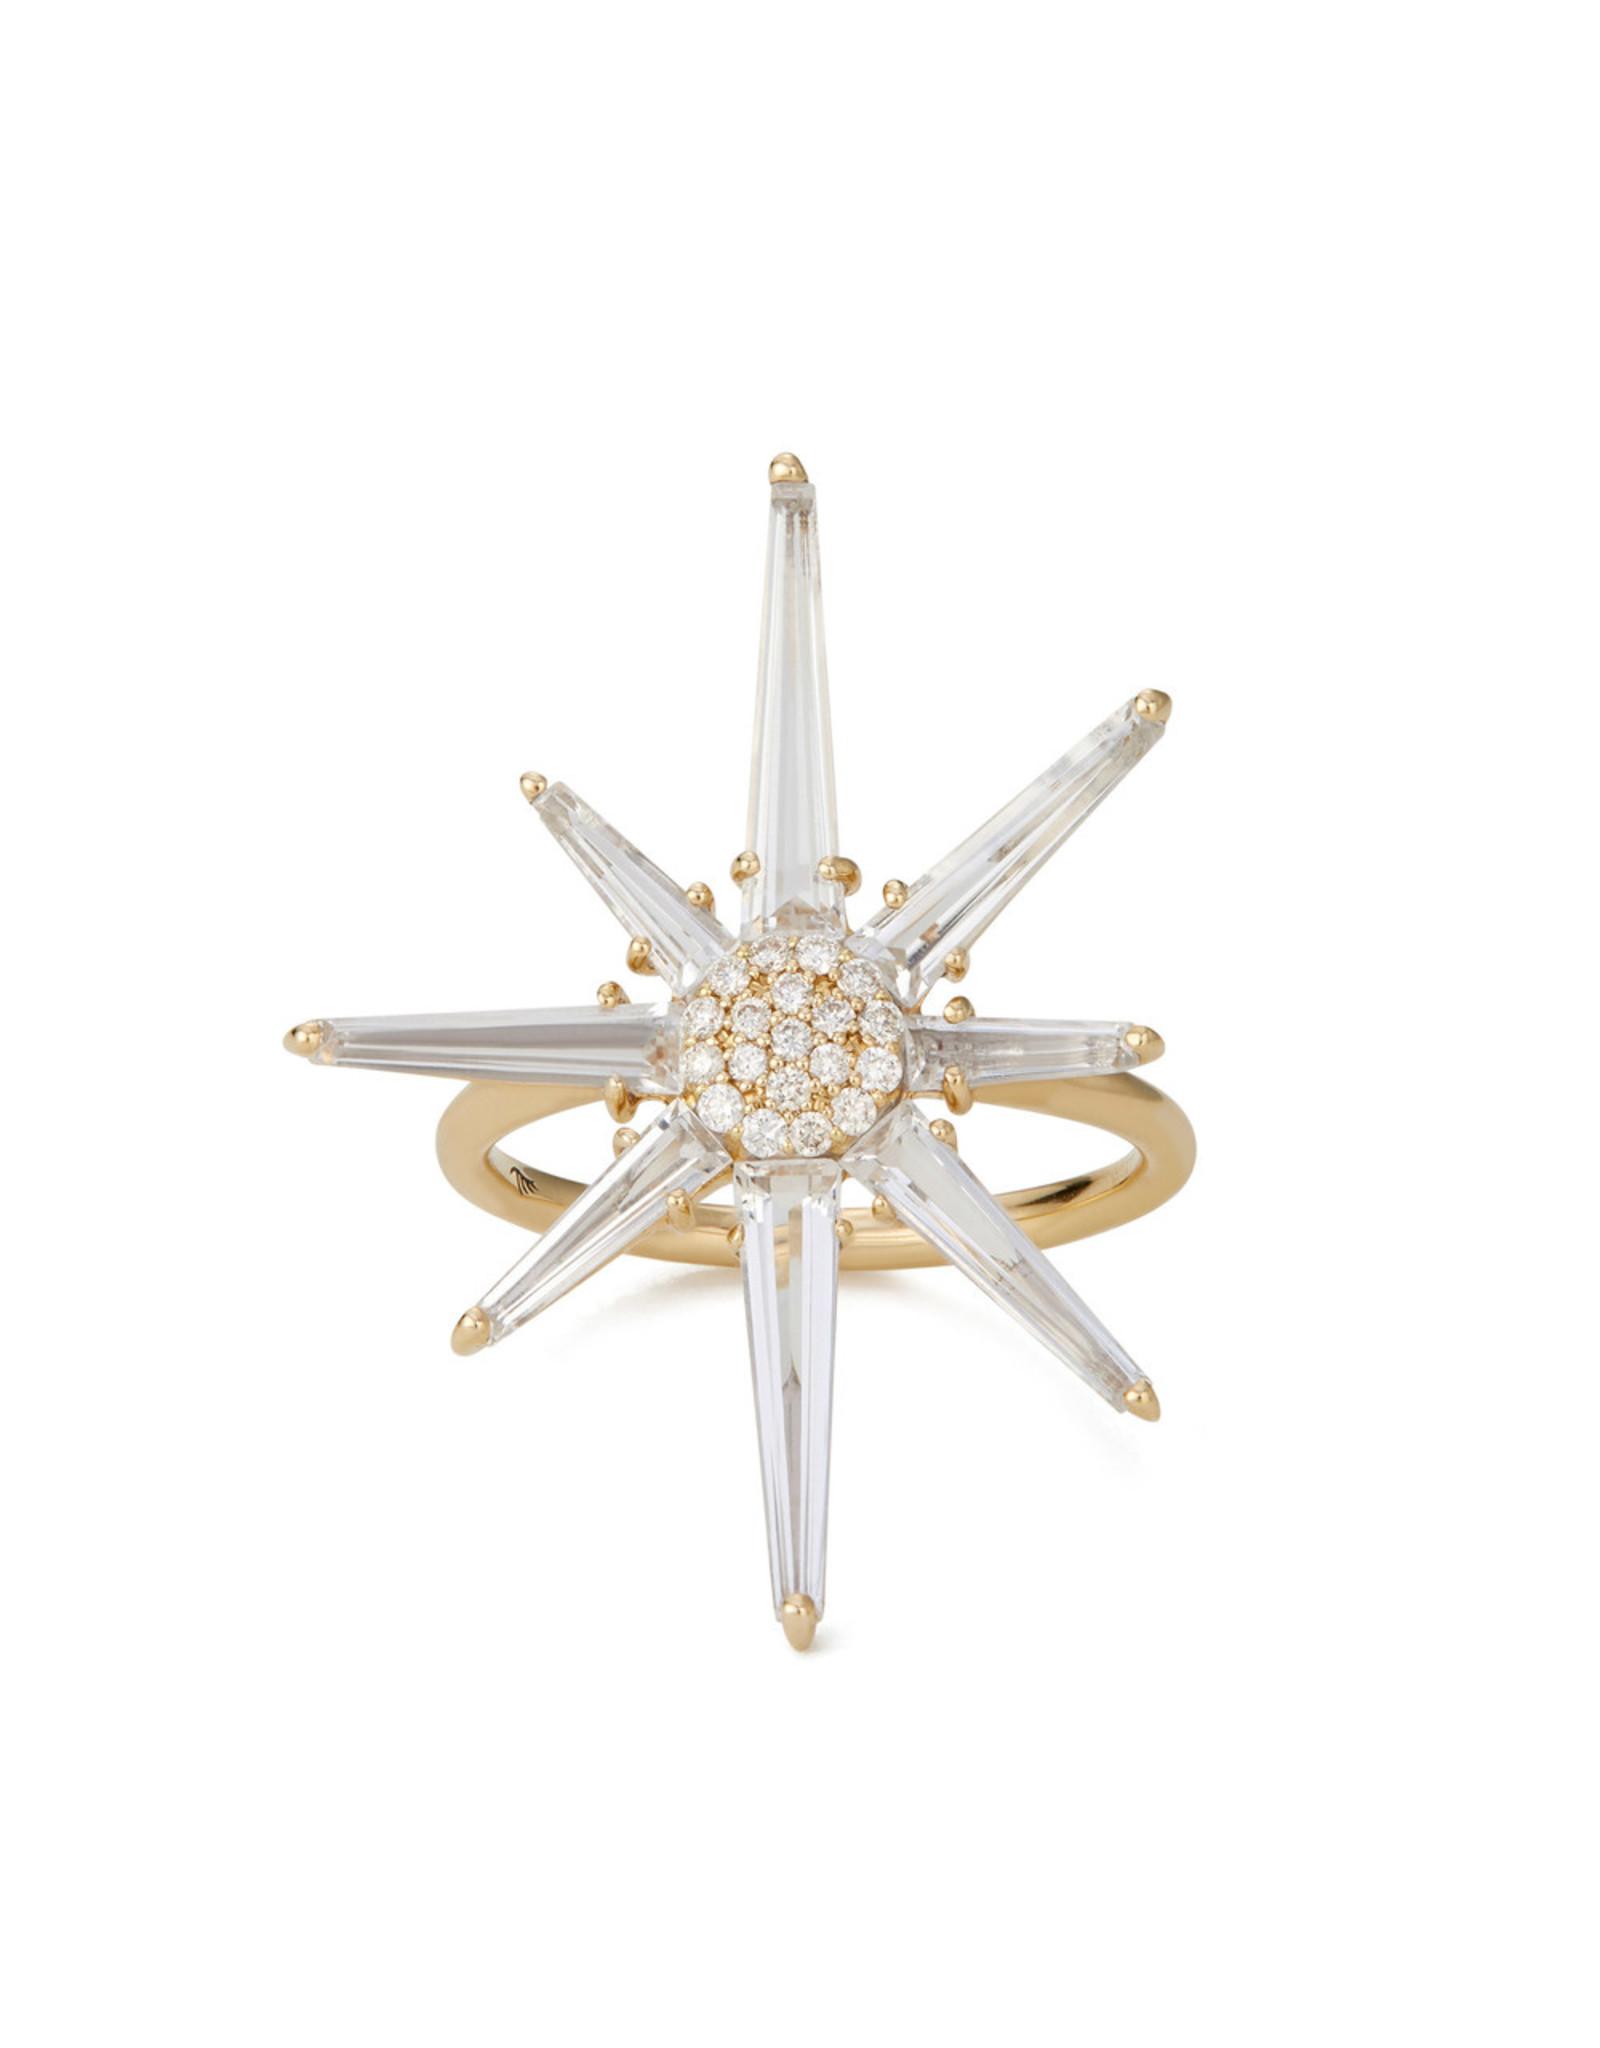 Bondeye Jewelry Bondeye Hera Diamond Ring (Color: Yellow Gold / White Topaz / White Diamond, Size: 6)